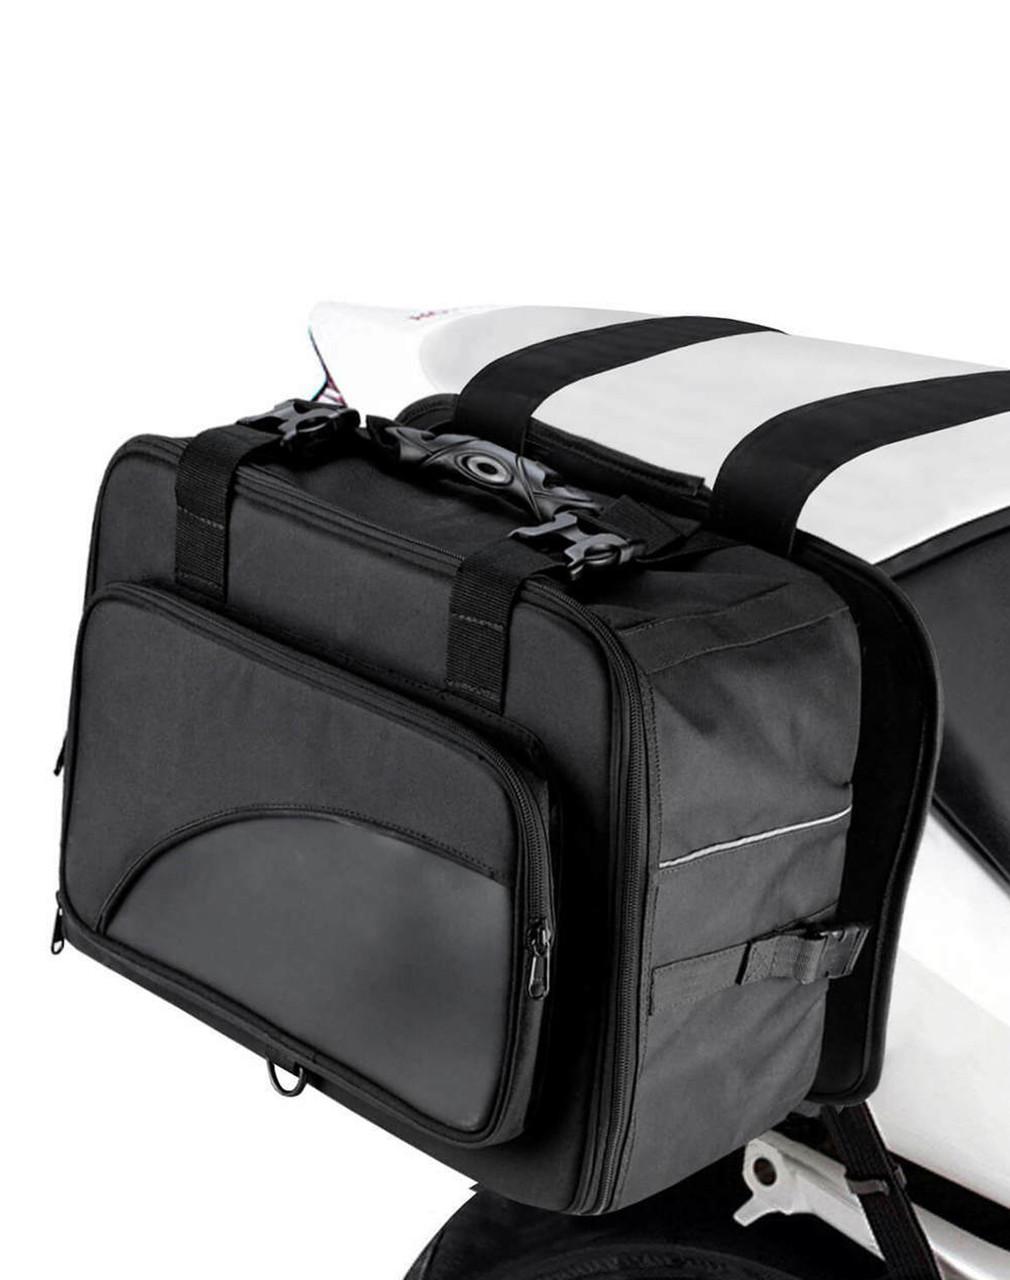 Viking Extra Large Black Street/Sportbike Saddlebag Bag on Bike Side View